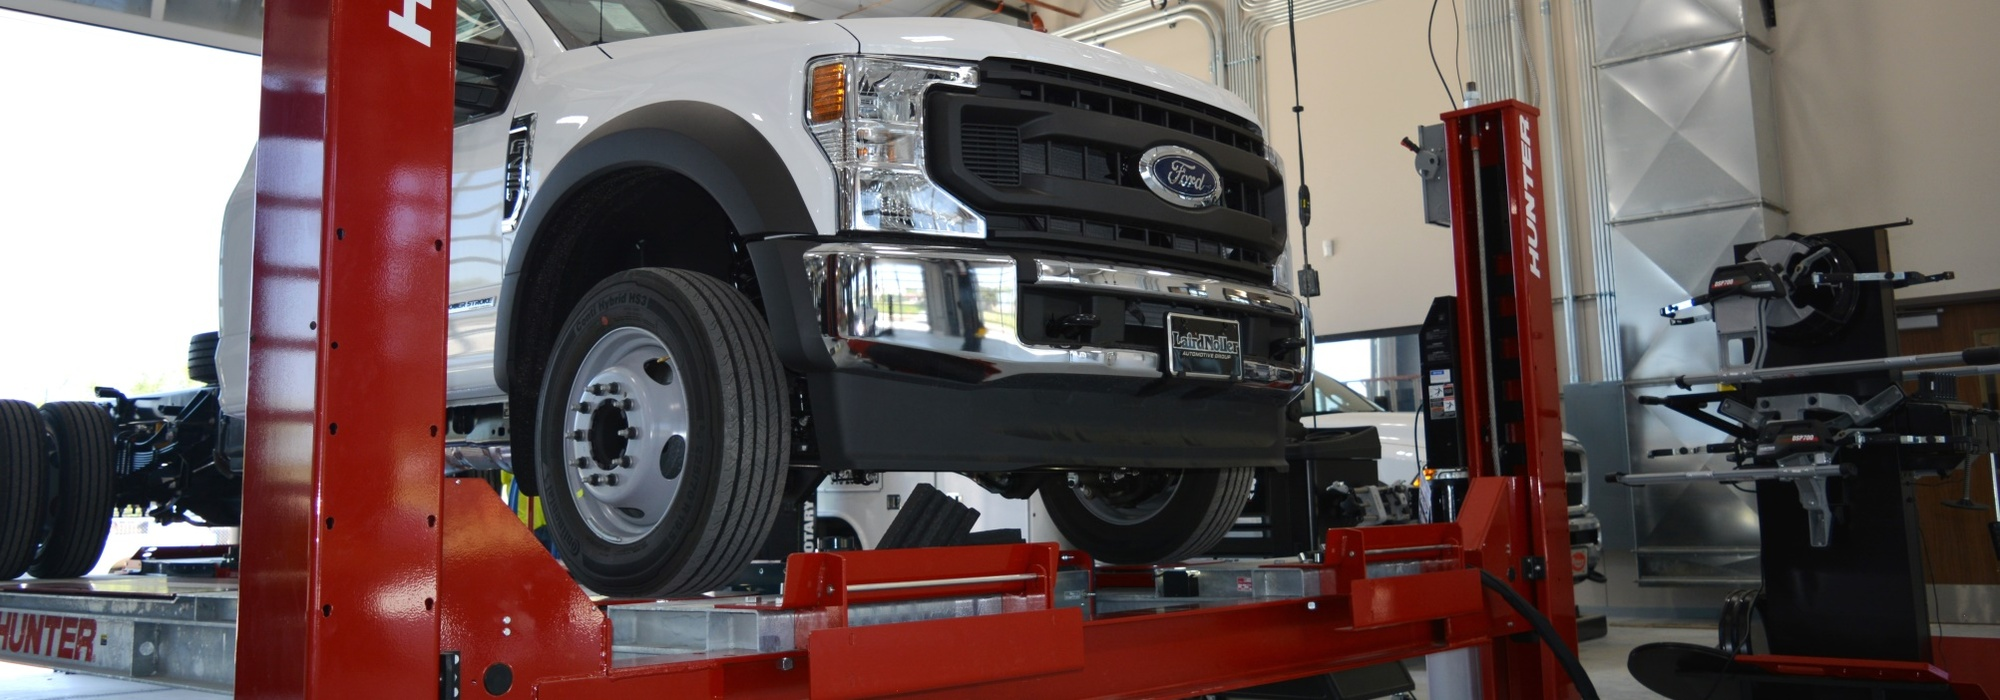 Lift Service & Repair